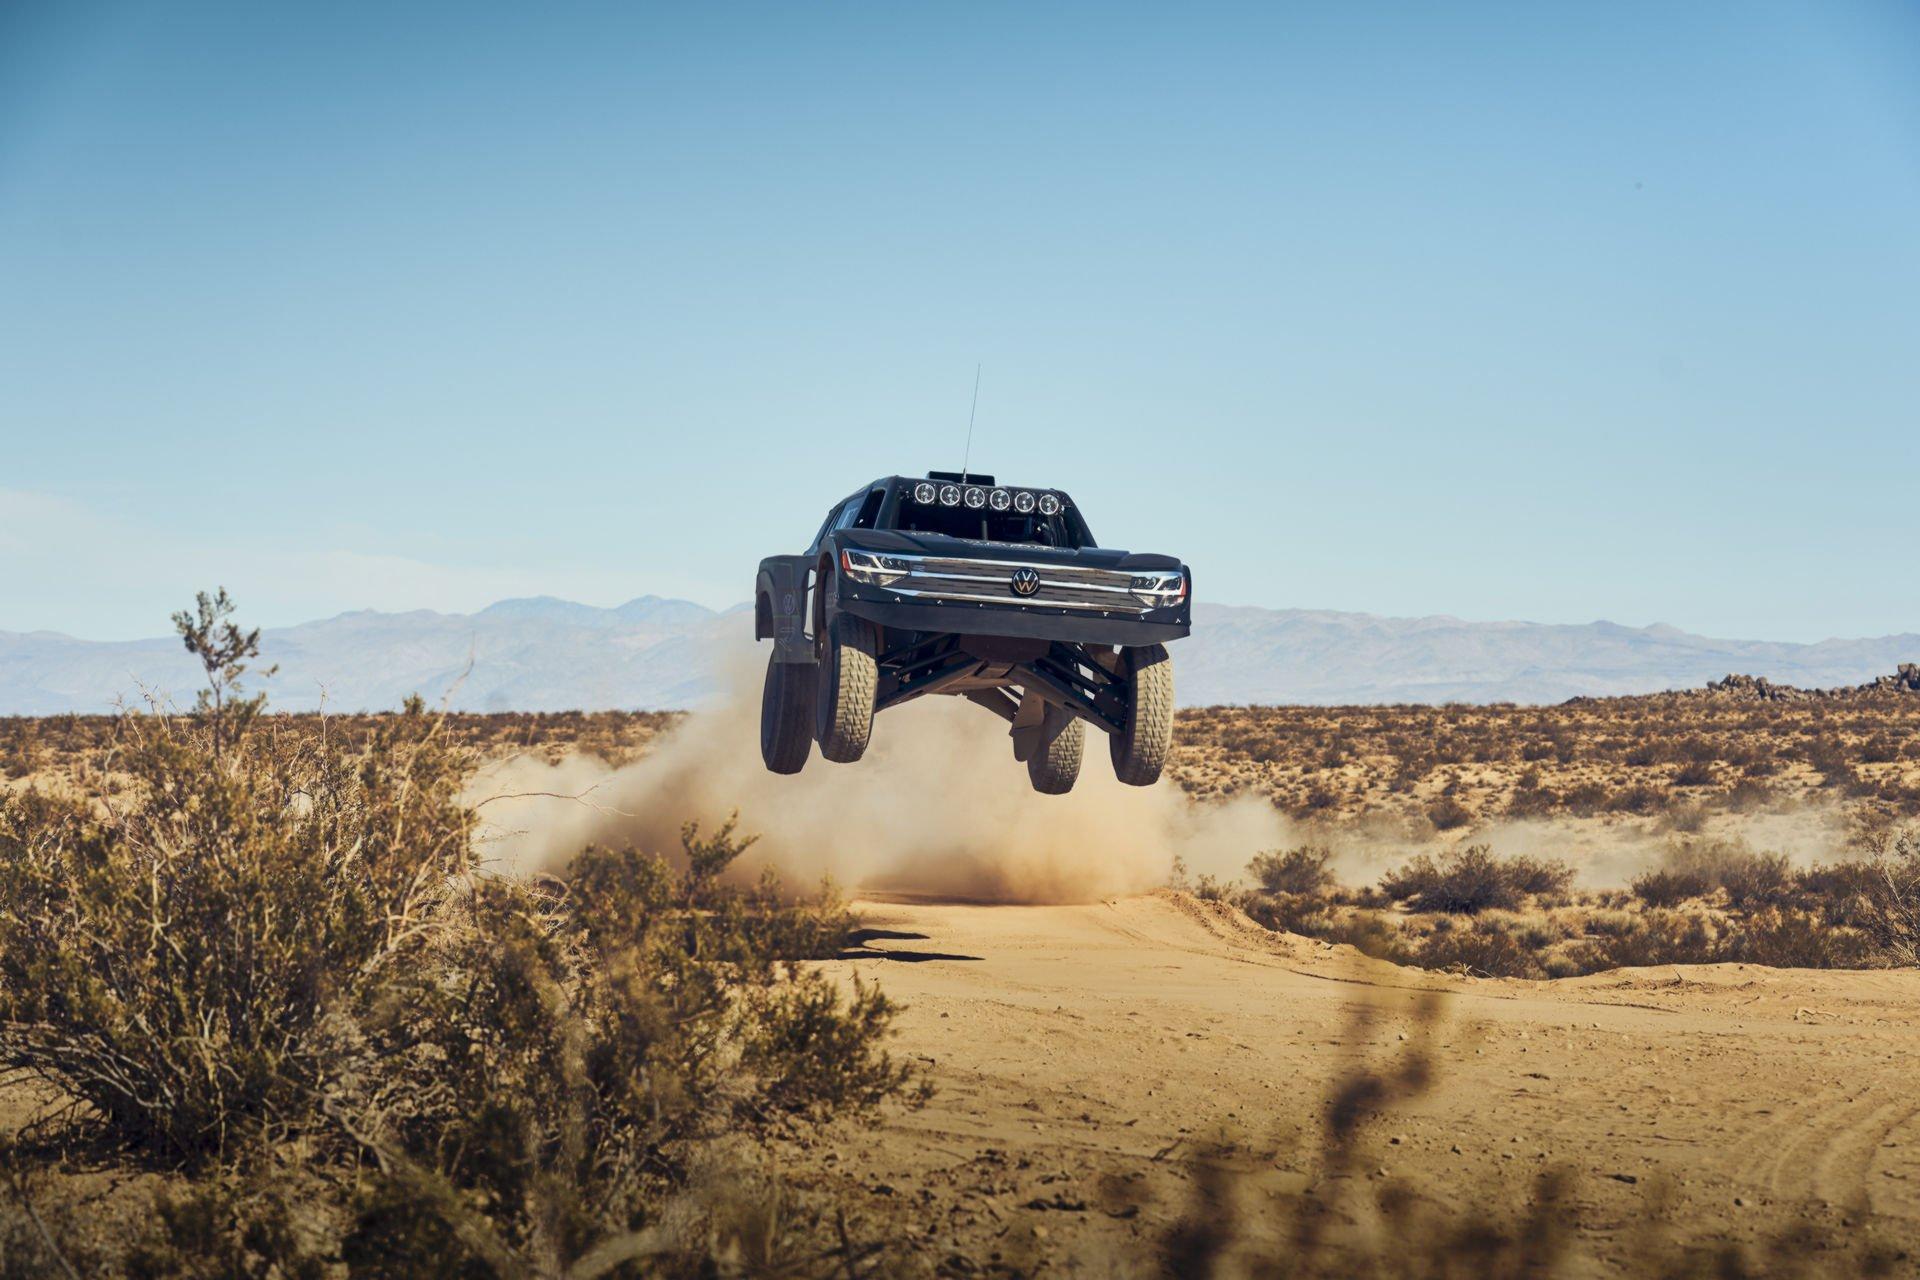 Tanner Foust Vw >> VW entering the 2020 Baja 1000 with Atlas Cross Sport R